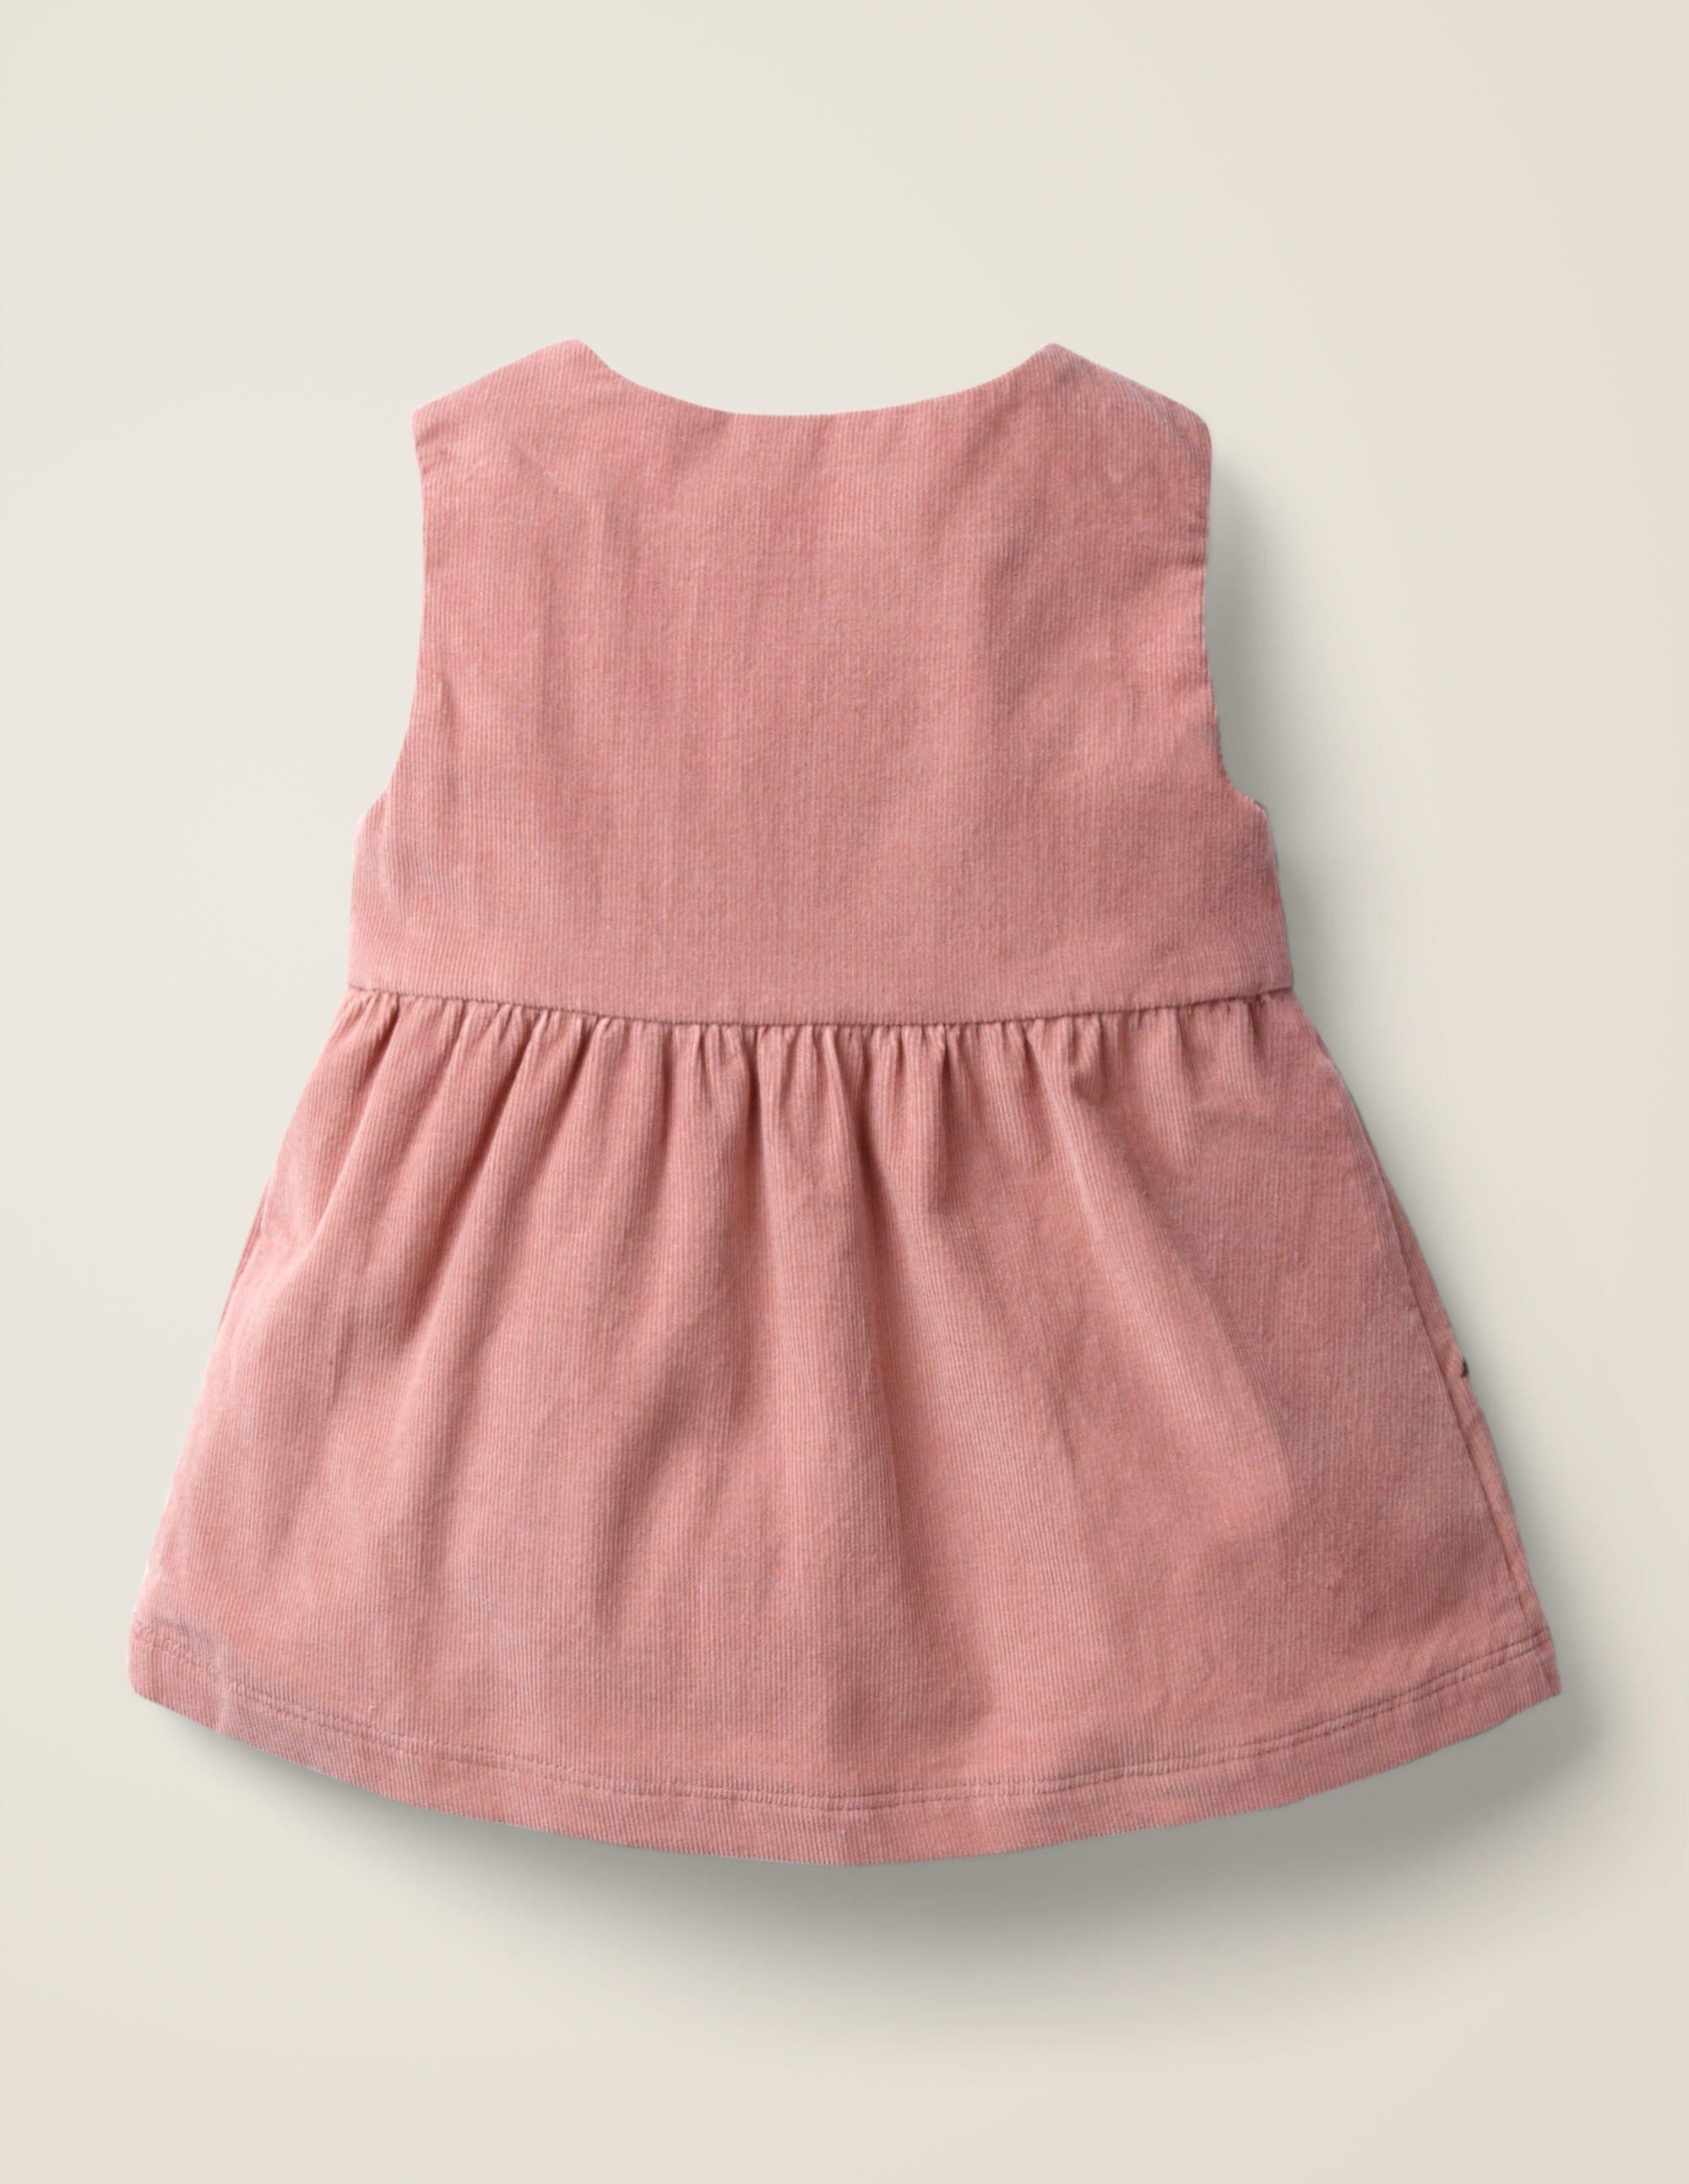 4 YEARS STRIPE APPLIQUE TUNIC DRESS NEW BABY MINI BODEN GIRLS 3 MONTHS